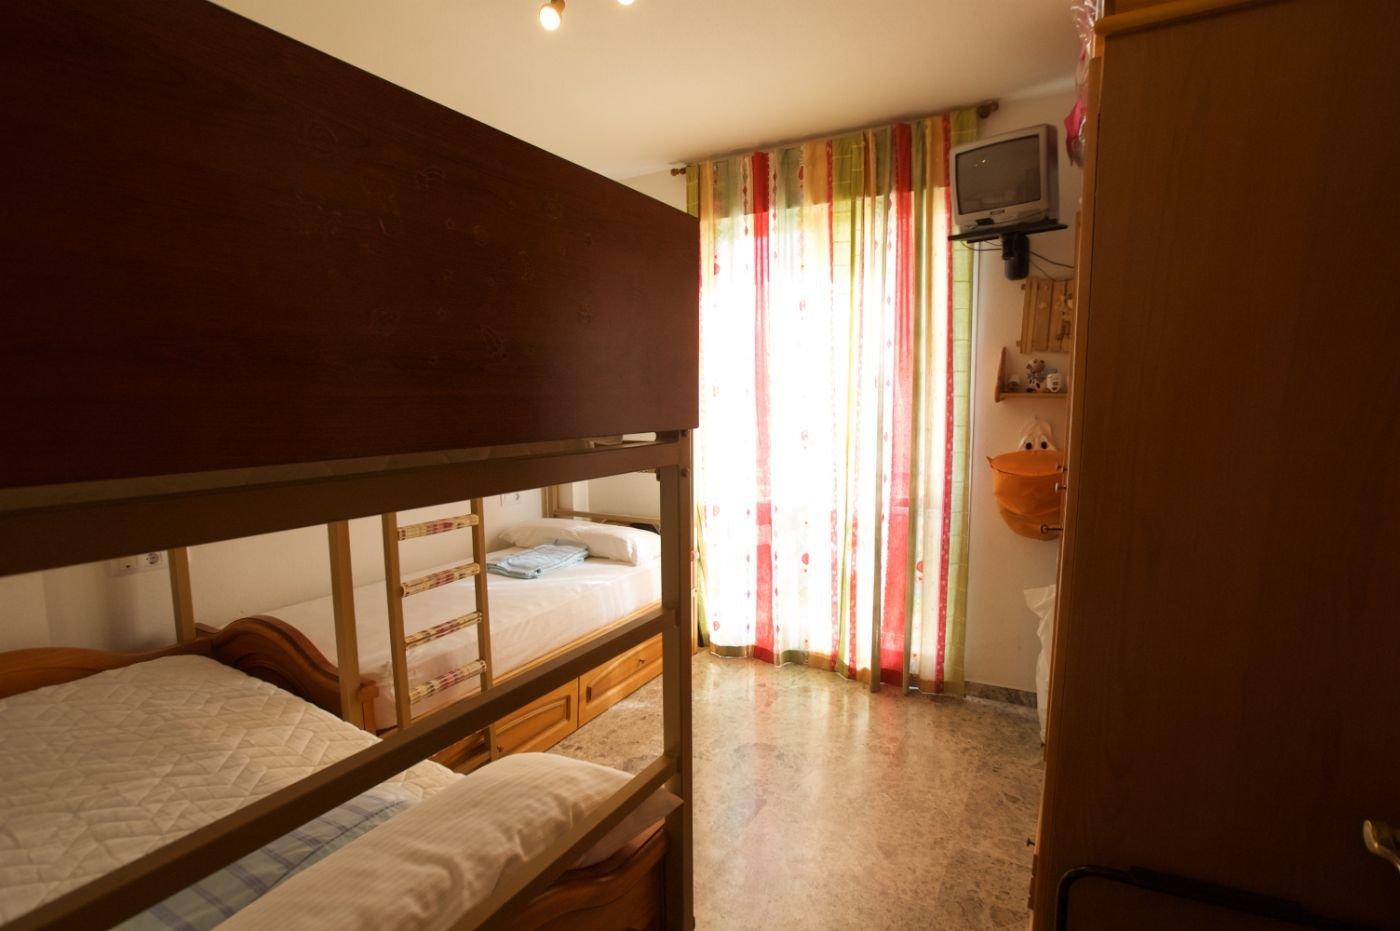 For sale of apartment in Algarrobo Costa